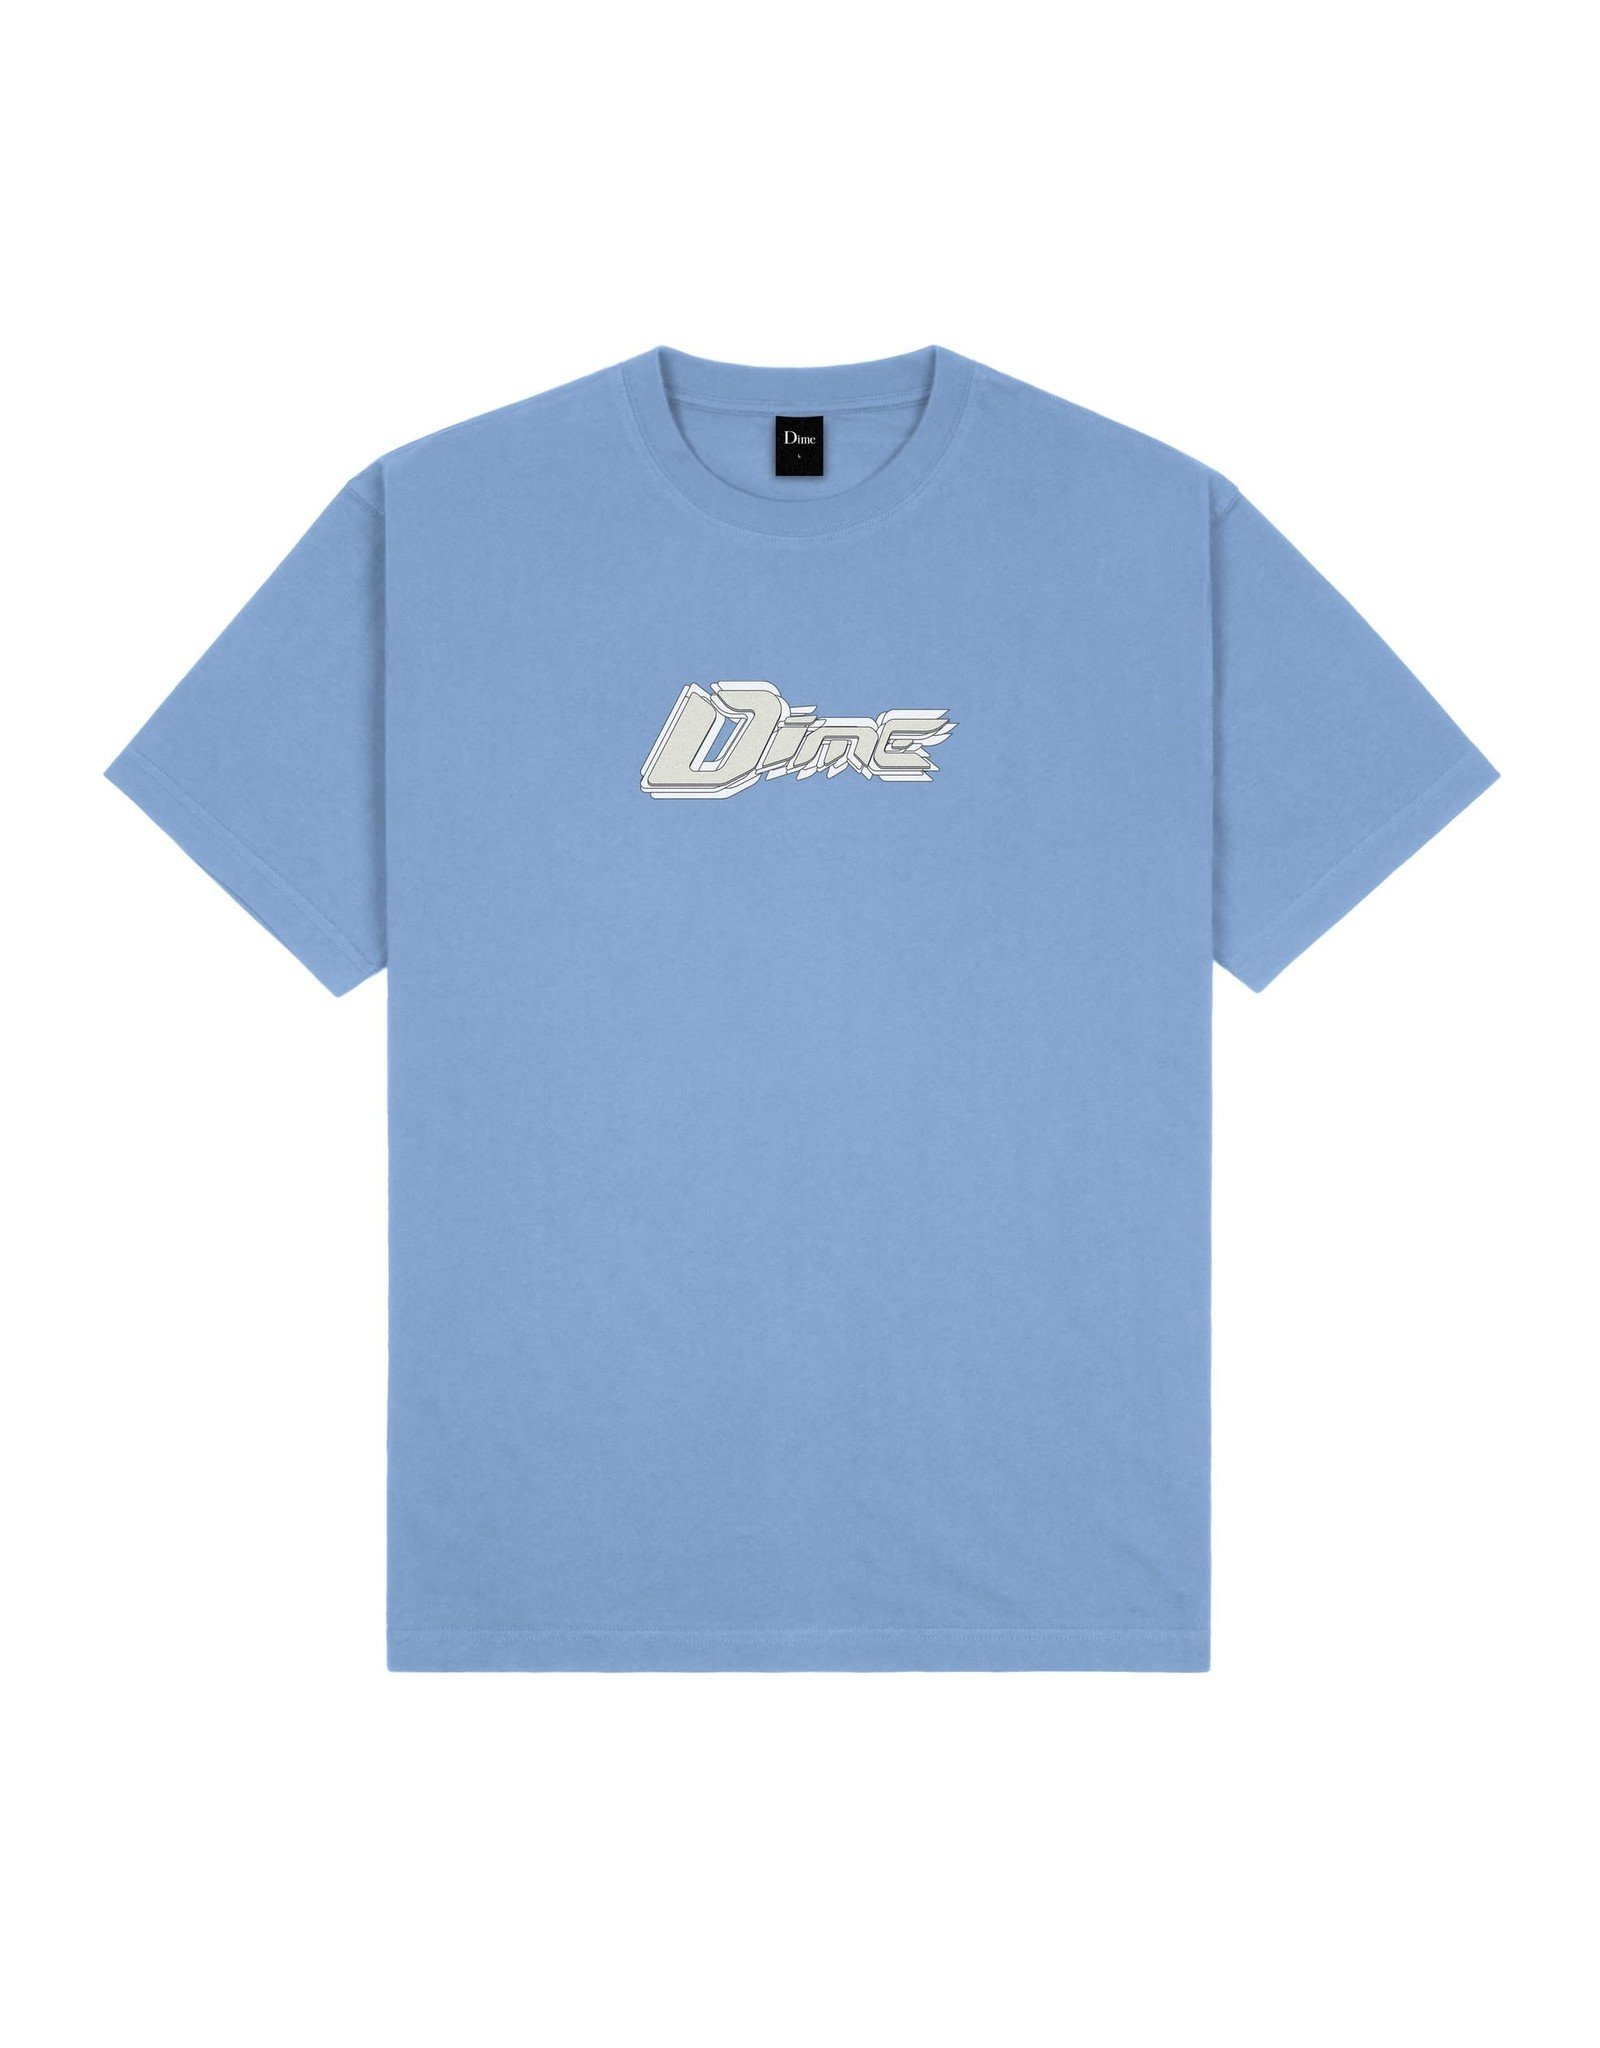 Dime Exo T-Shirt - Carolina Blue